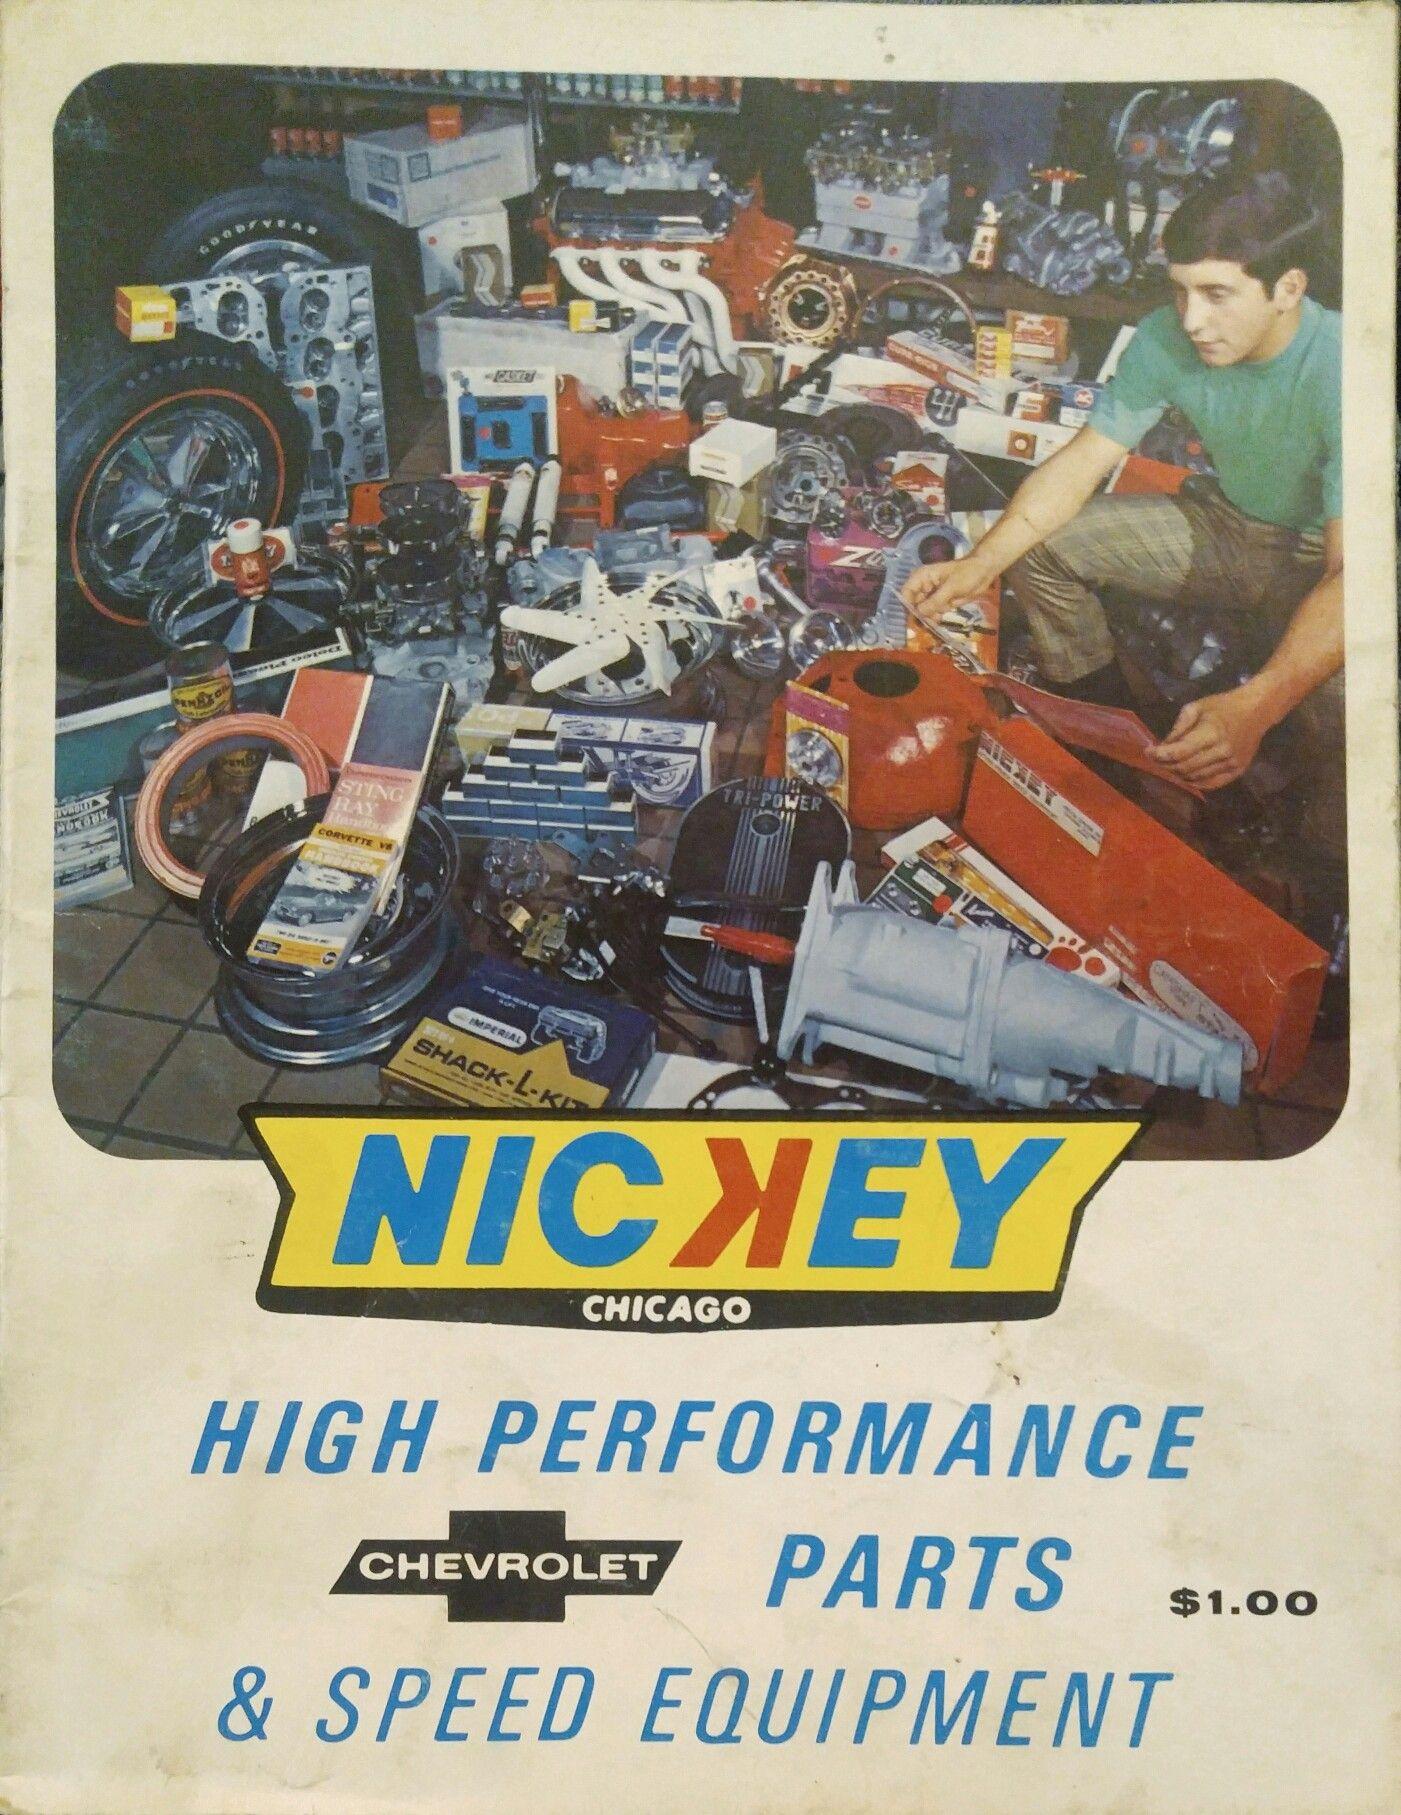 1969 Nickey Chicago High Performance Chevrolet Parts Catalog Chevrolet Parts Chevrolet Chicago